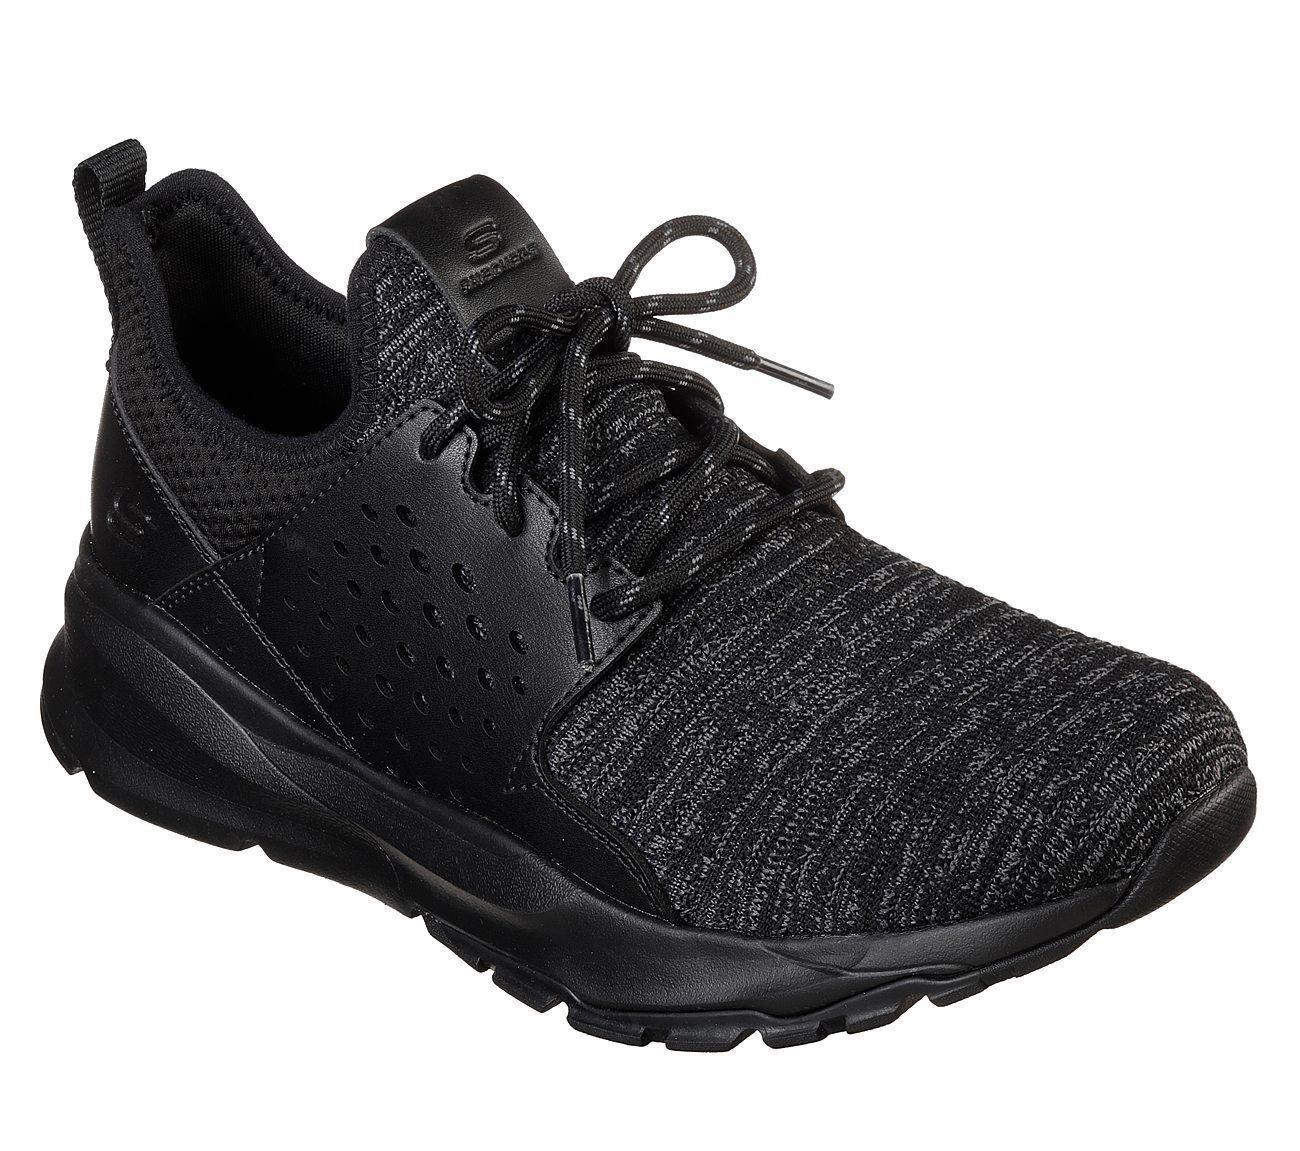 Skechers men Relven - Velton shoes black